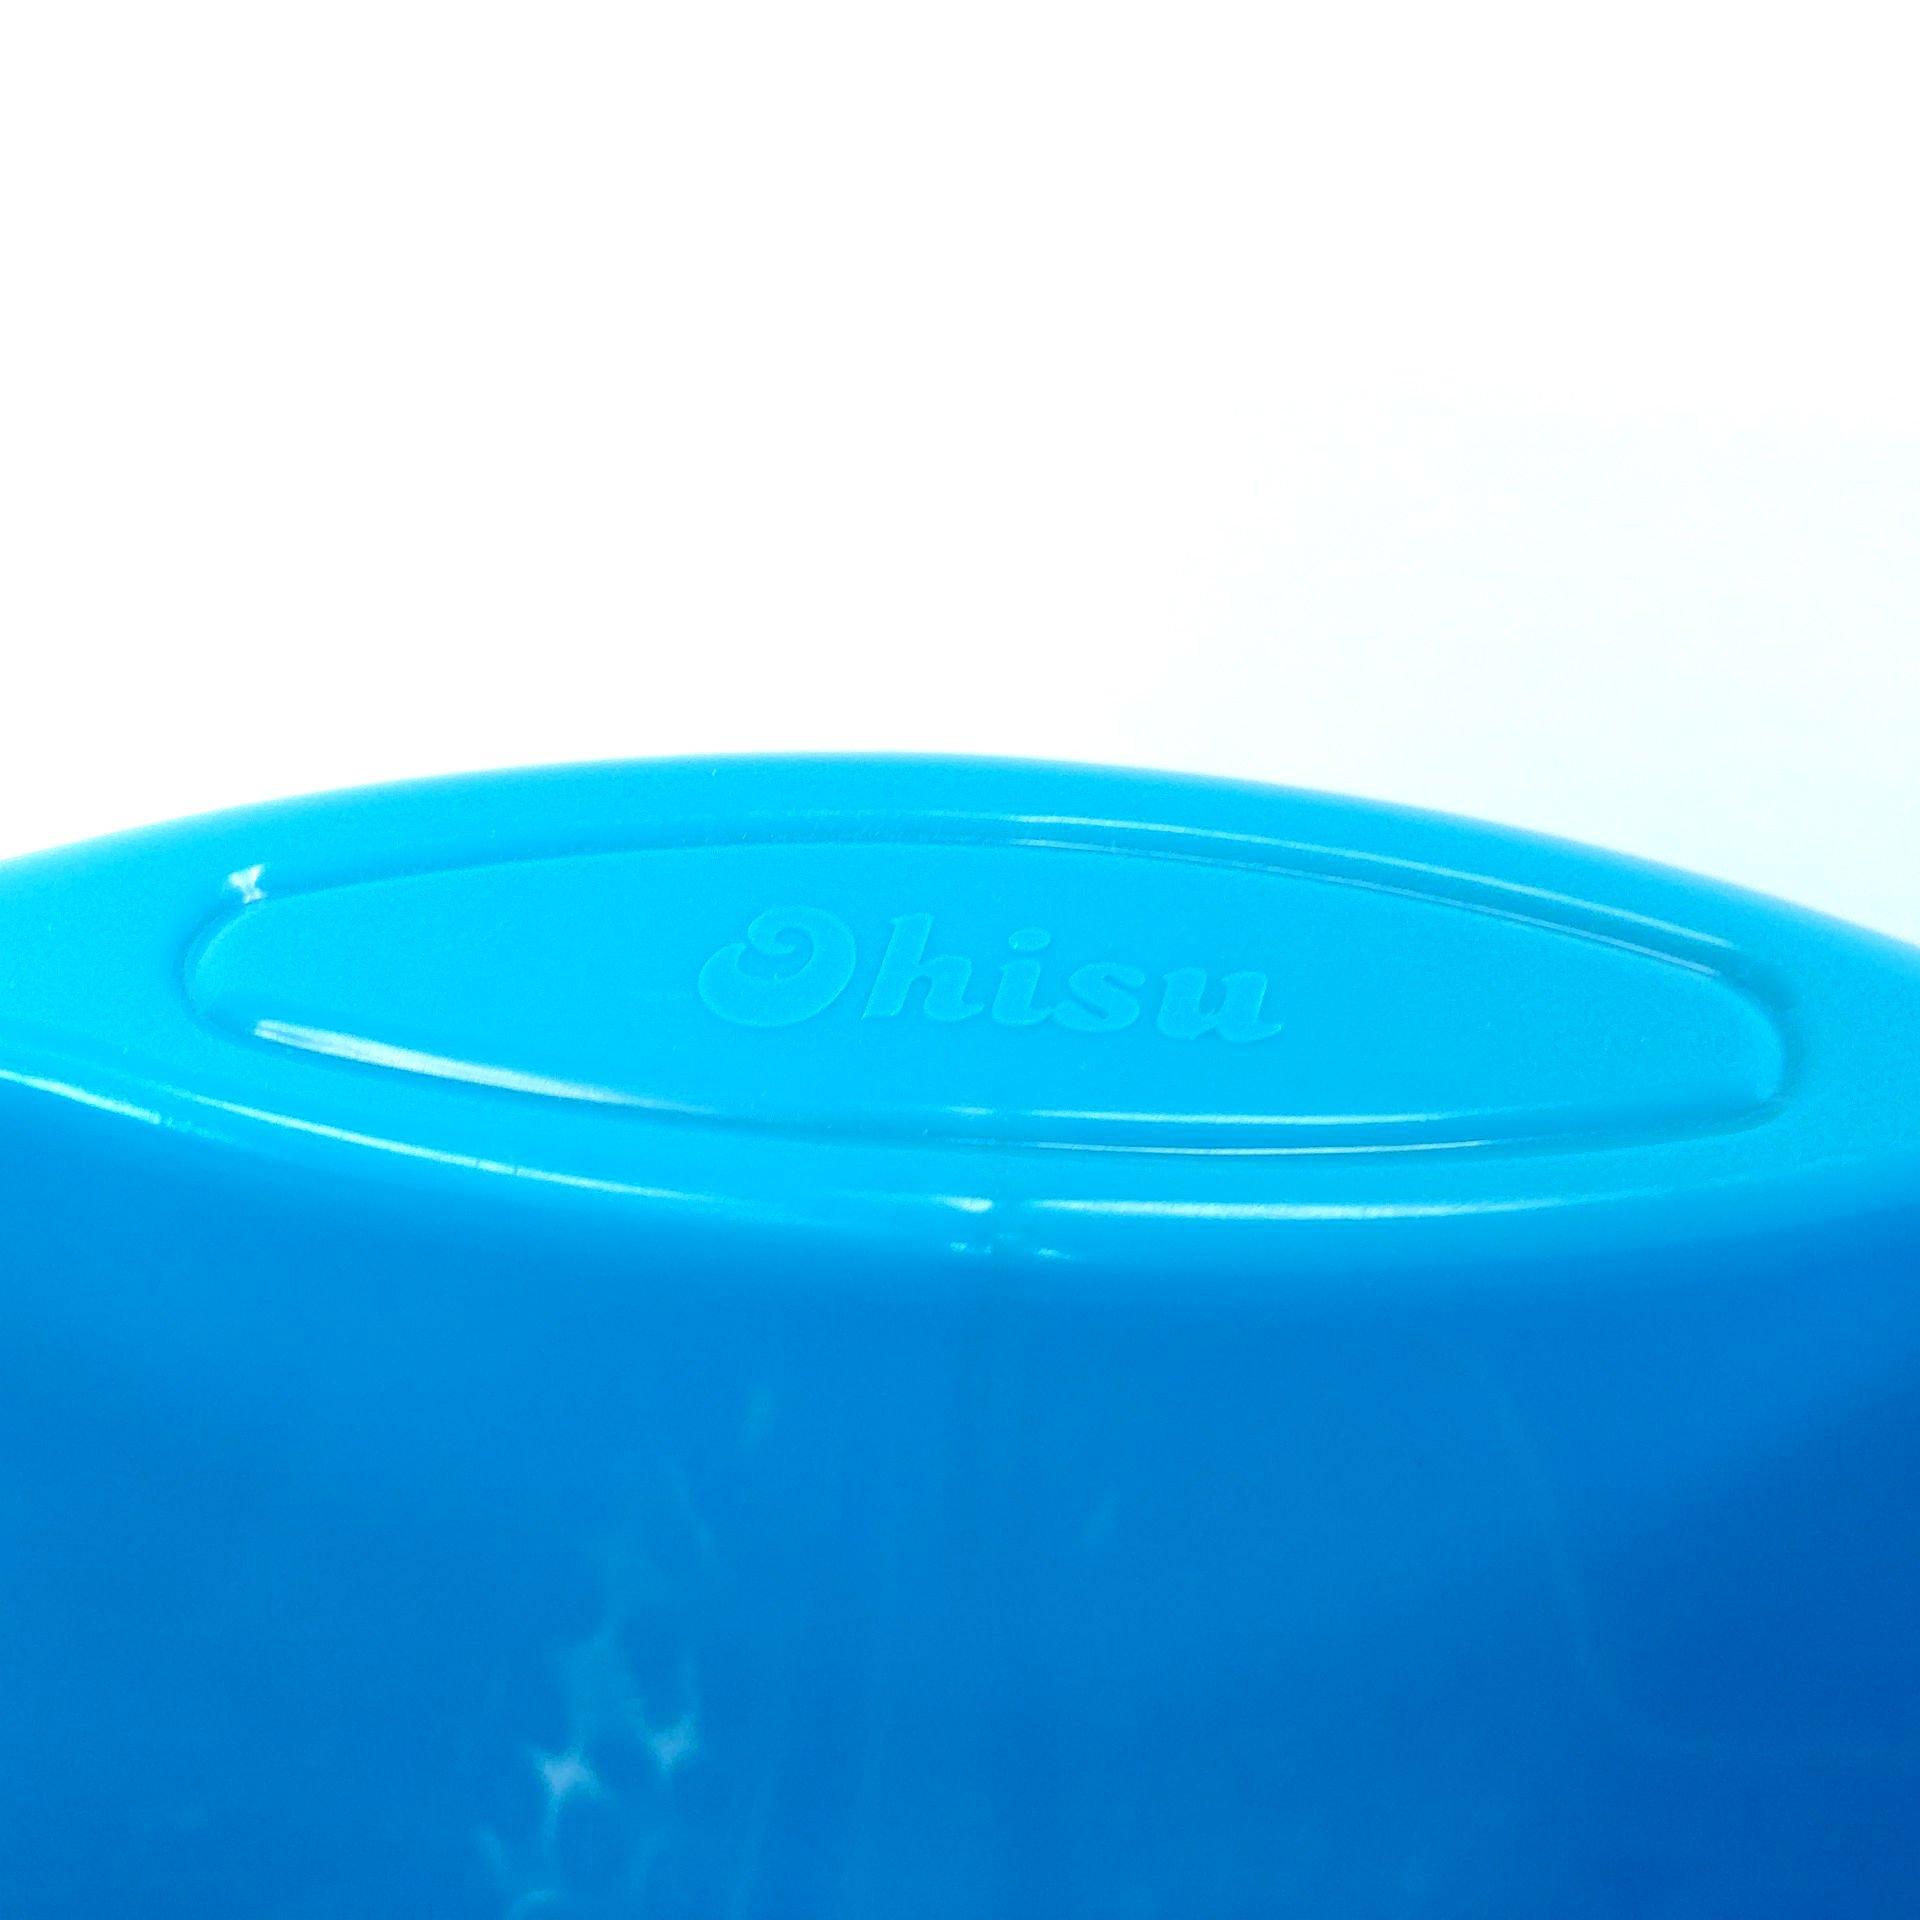 Ohisu Blue Foot Basin for Foot Bath, Soak, or Detox by Ohisu (Image #6)